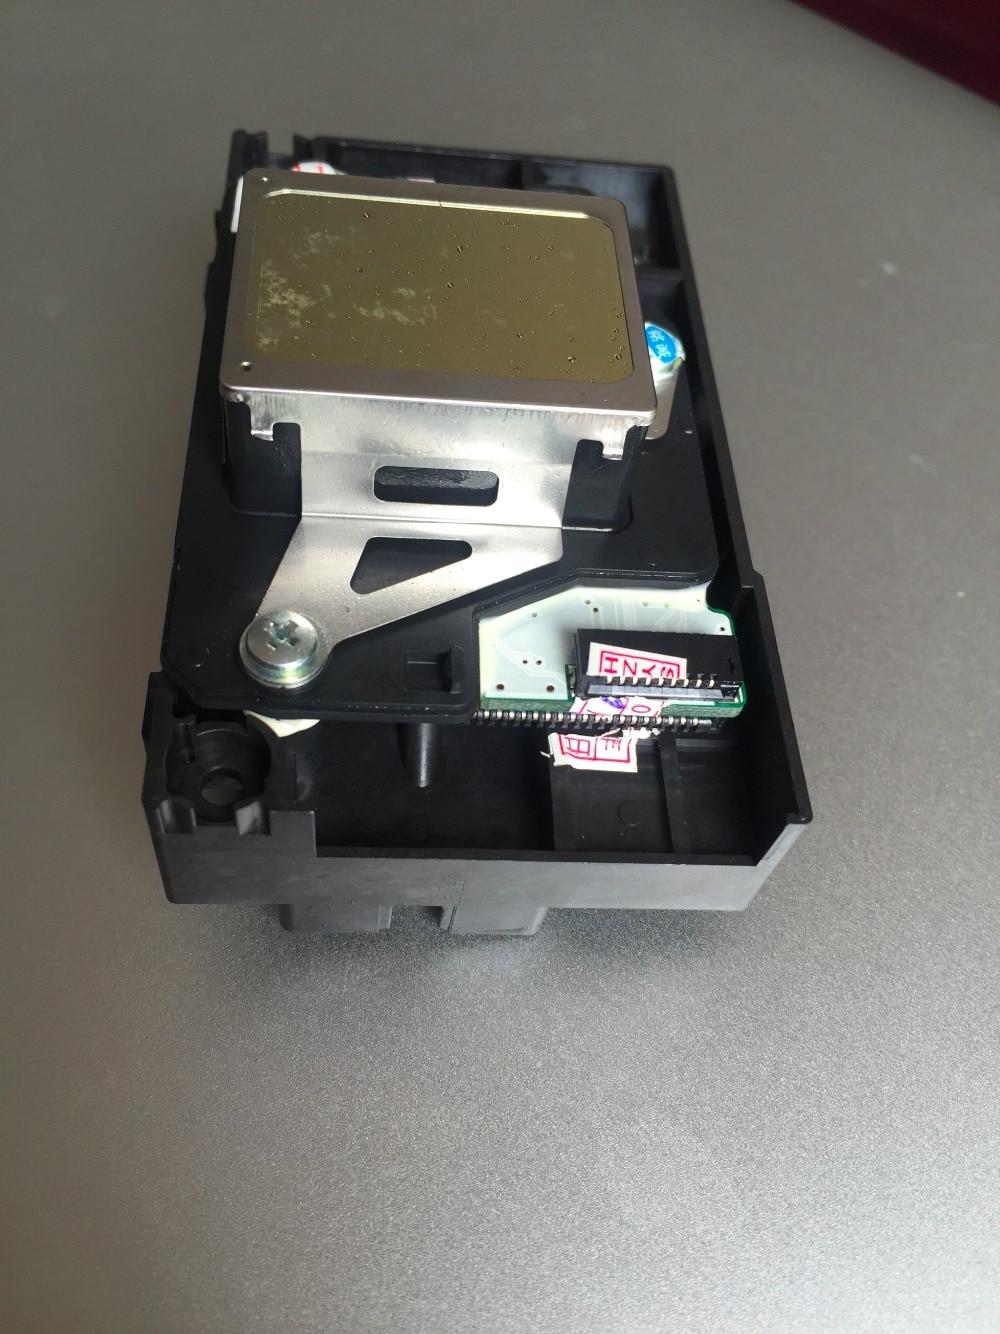 REFURBISHED Print Head FOR EPSON R270 R260 R265 R360 PRINTHEAD L1800